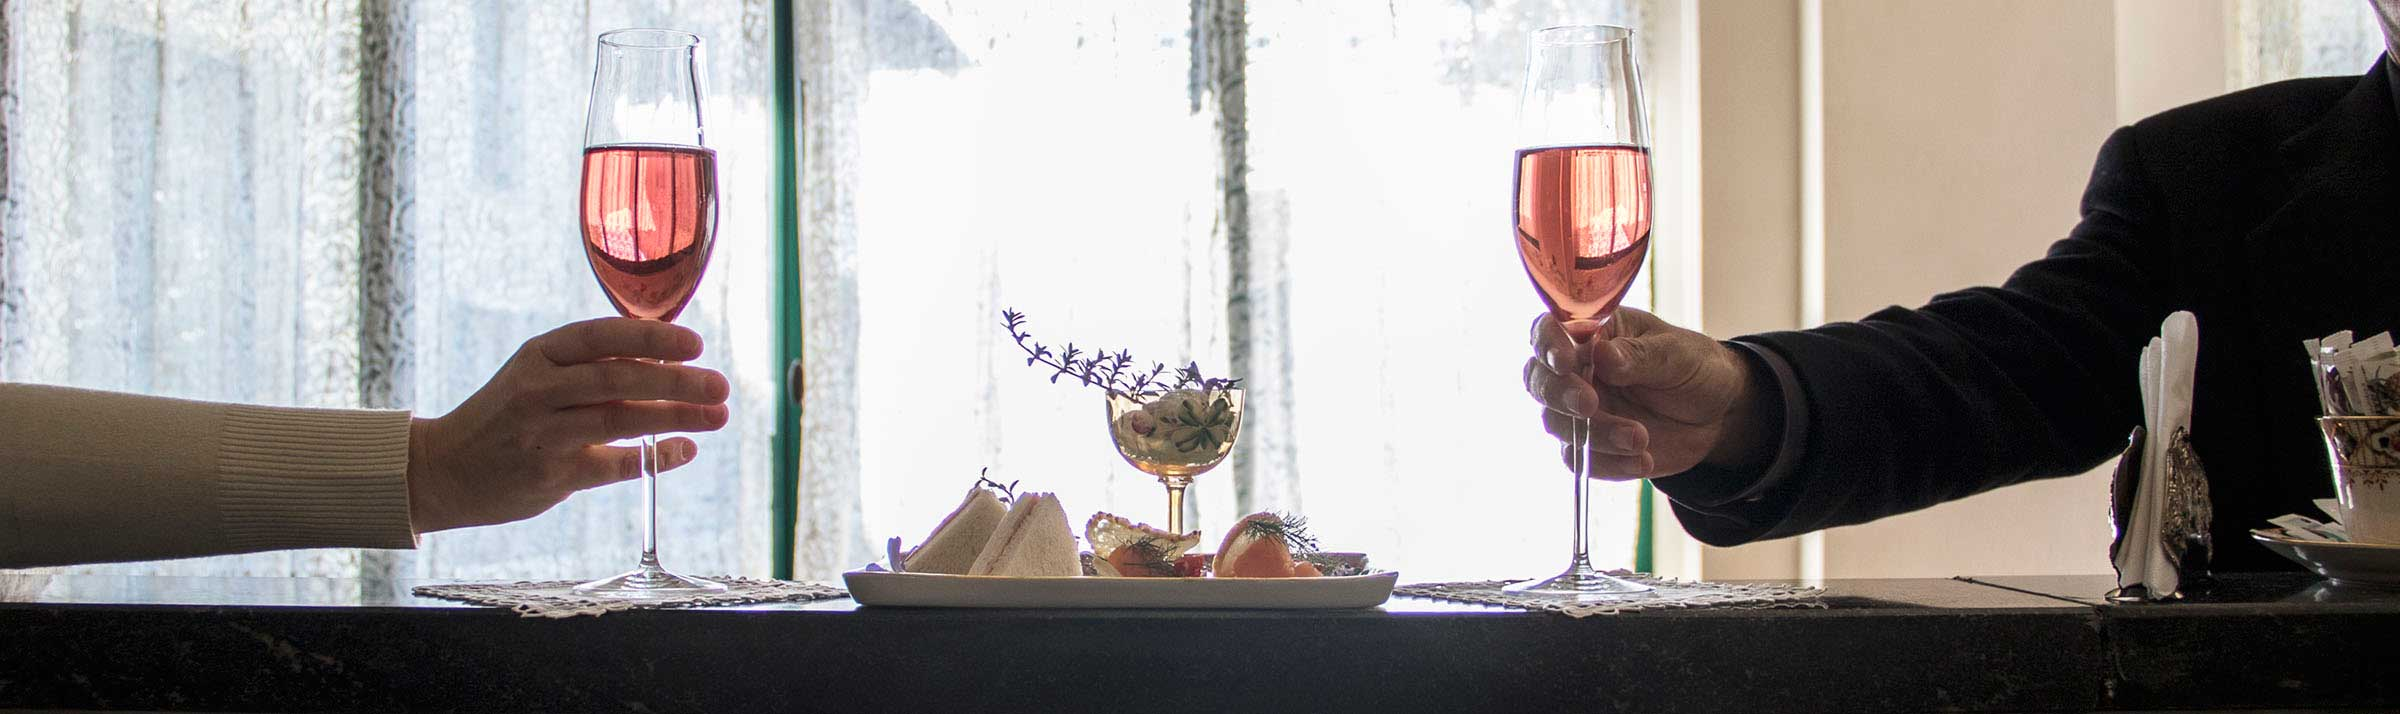 Aperitivo-liberty-caffetteria-bar-le-jardin-fleuri-gusti-liberty